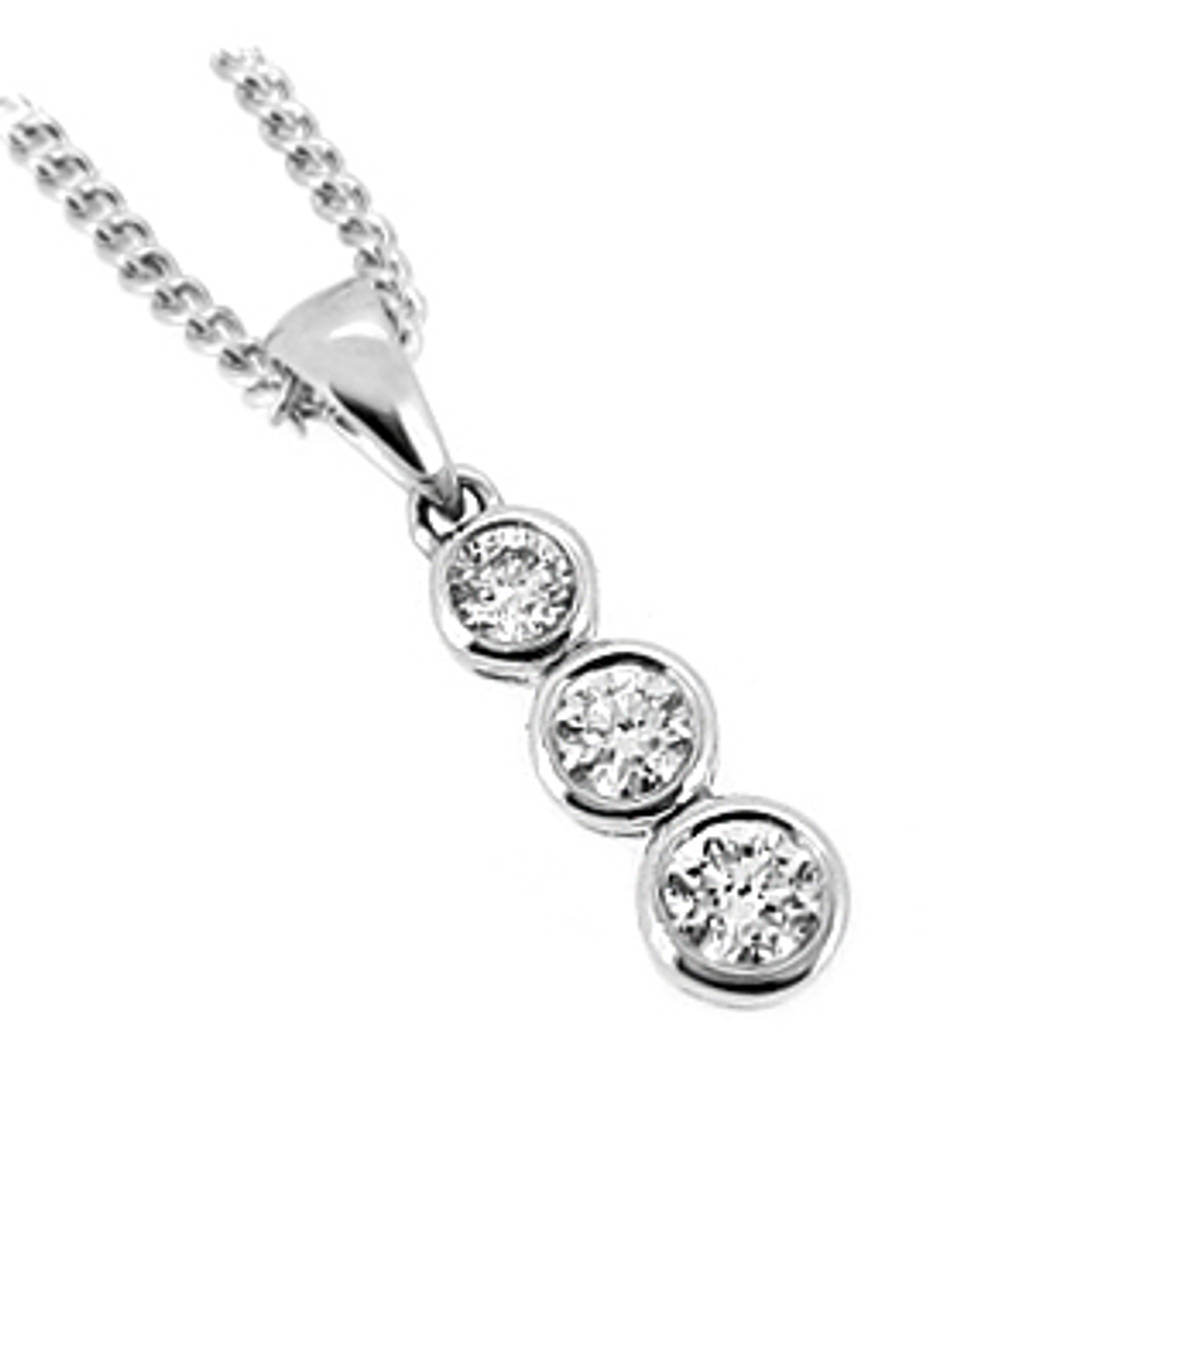 DP38363 stone diamond rubover set drop pendantPictured item: total 0.33ct brilliant cut diamond set in 18k white gold